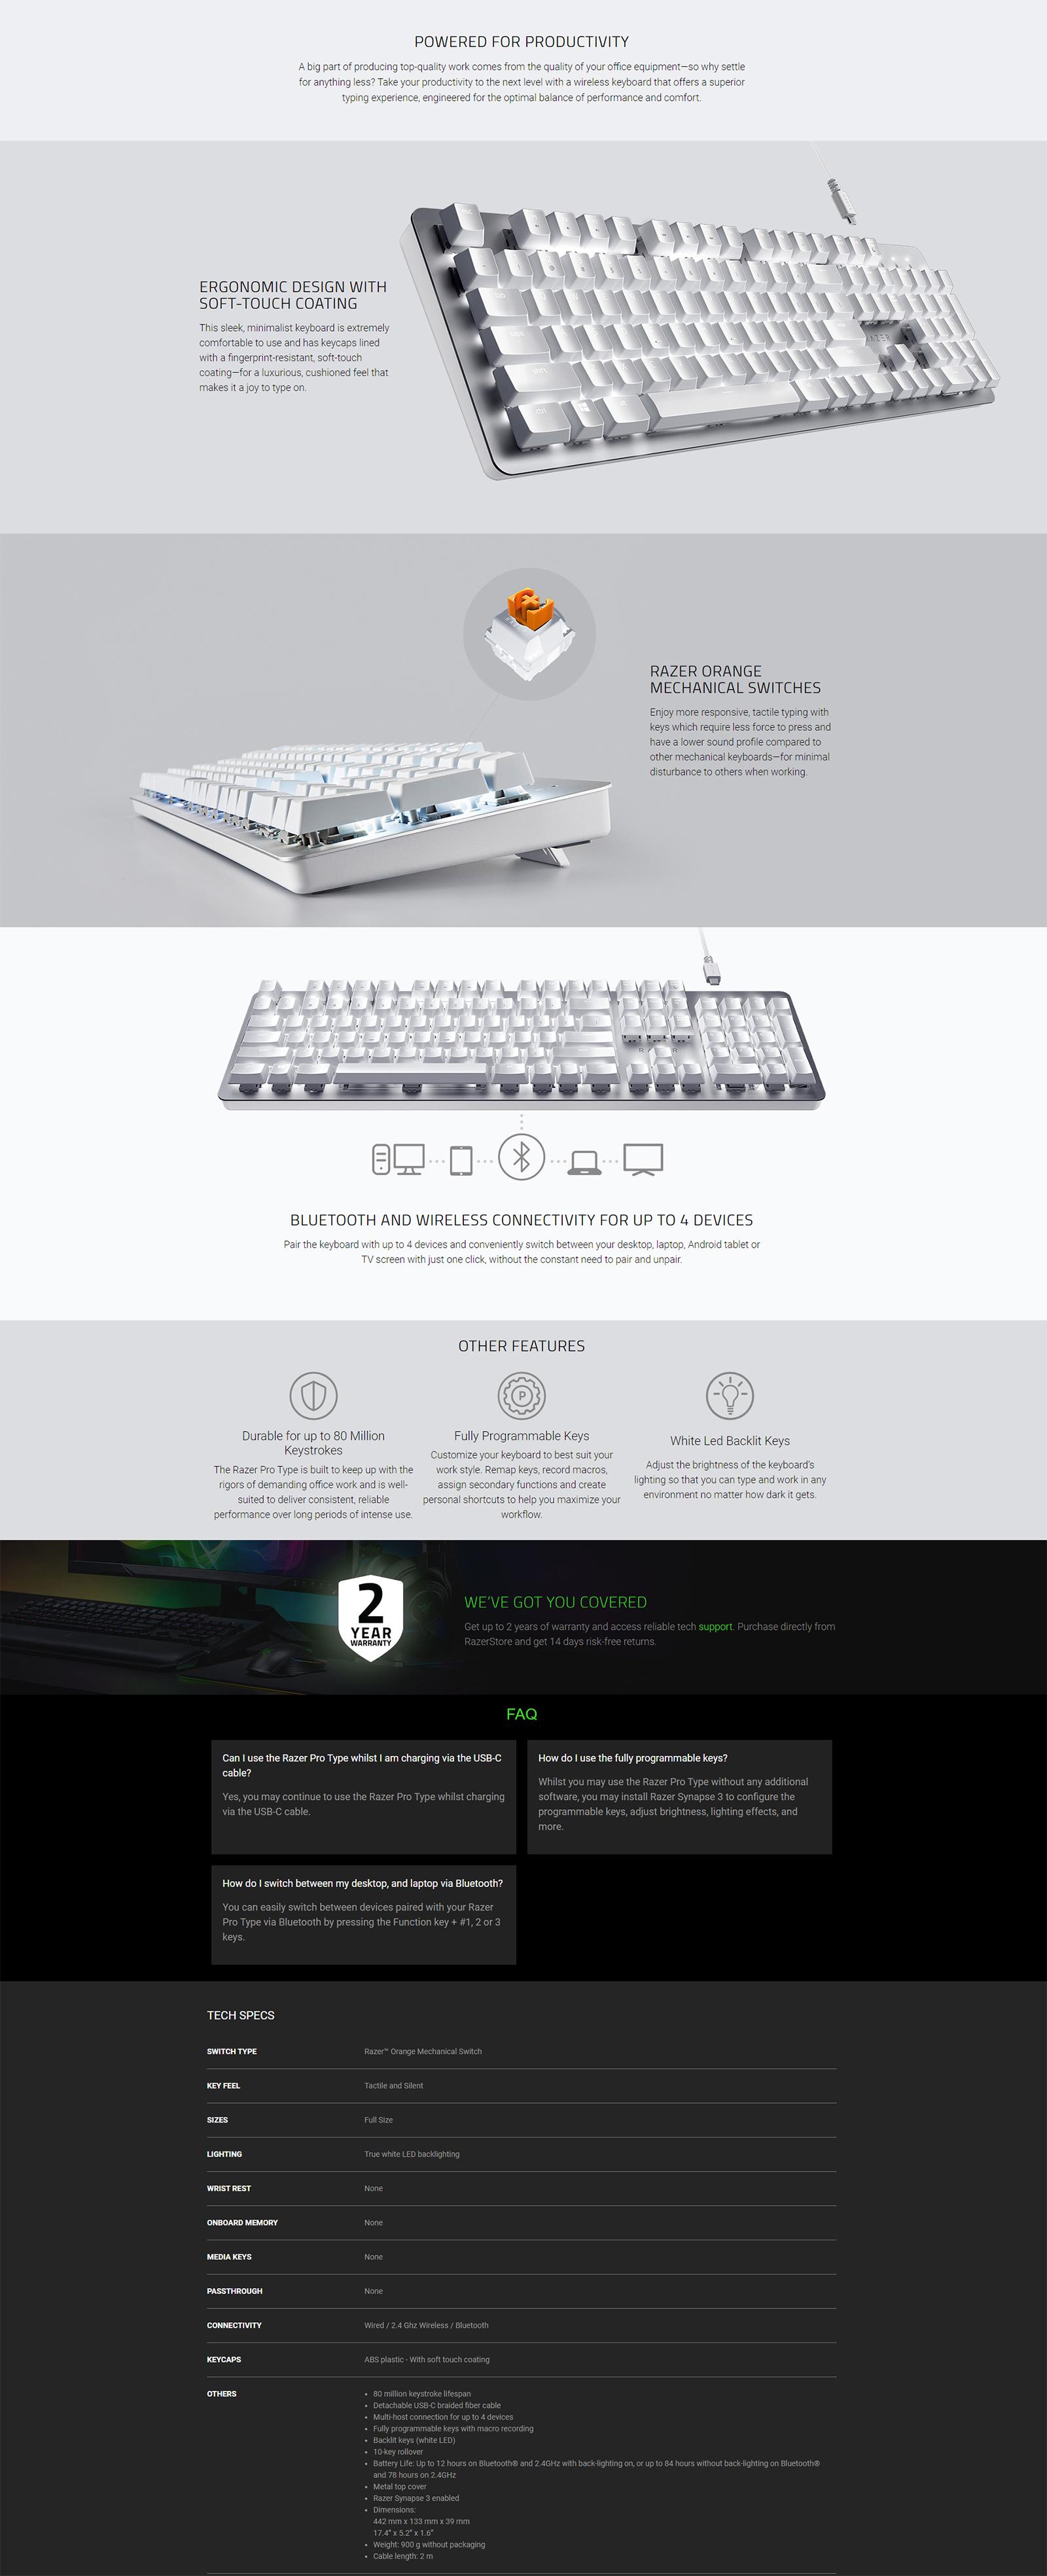 Buy Razer BlackWidow V3 mechanical keyboard